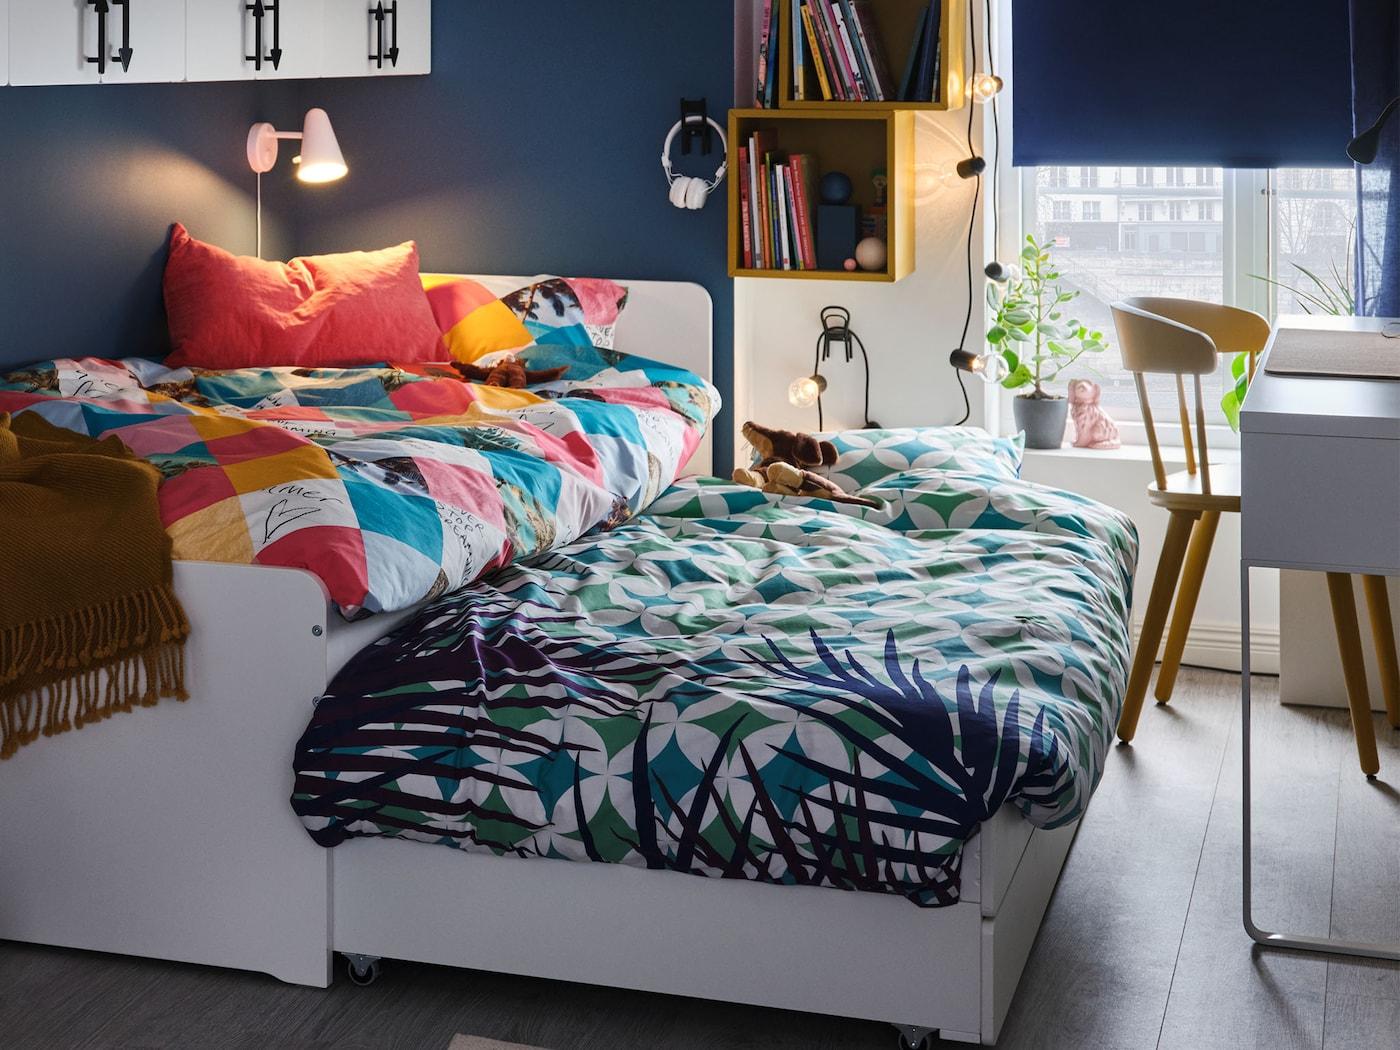 Children's furniture - IKEA Home Furnishings Malaysia